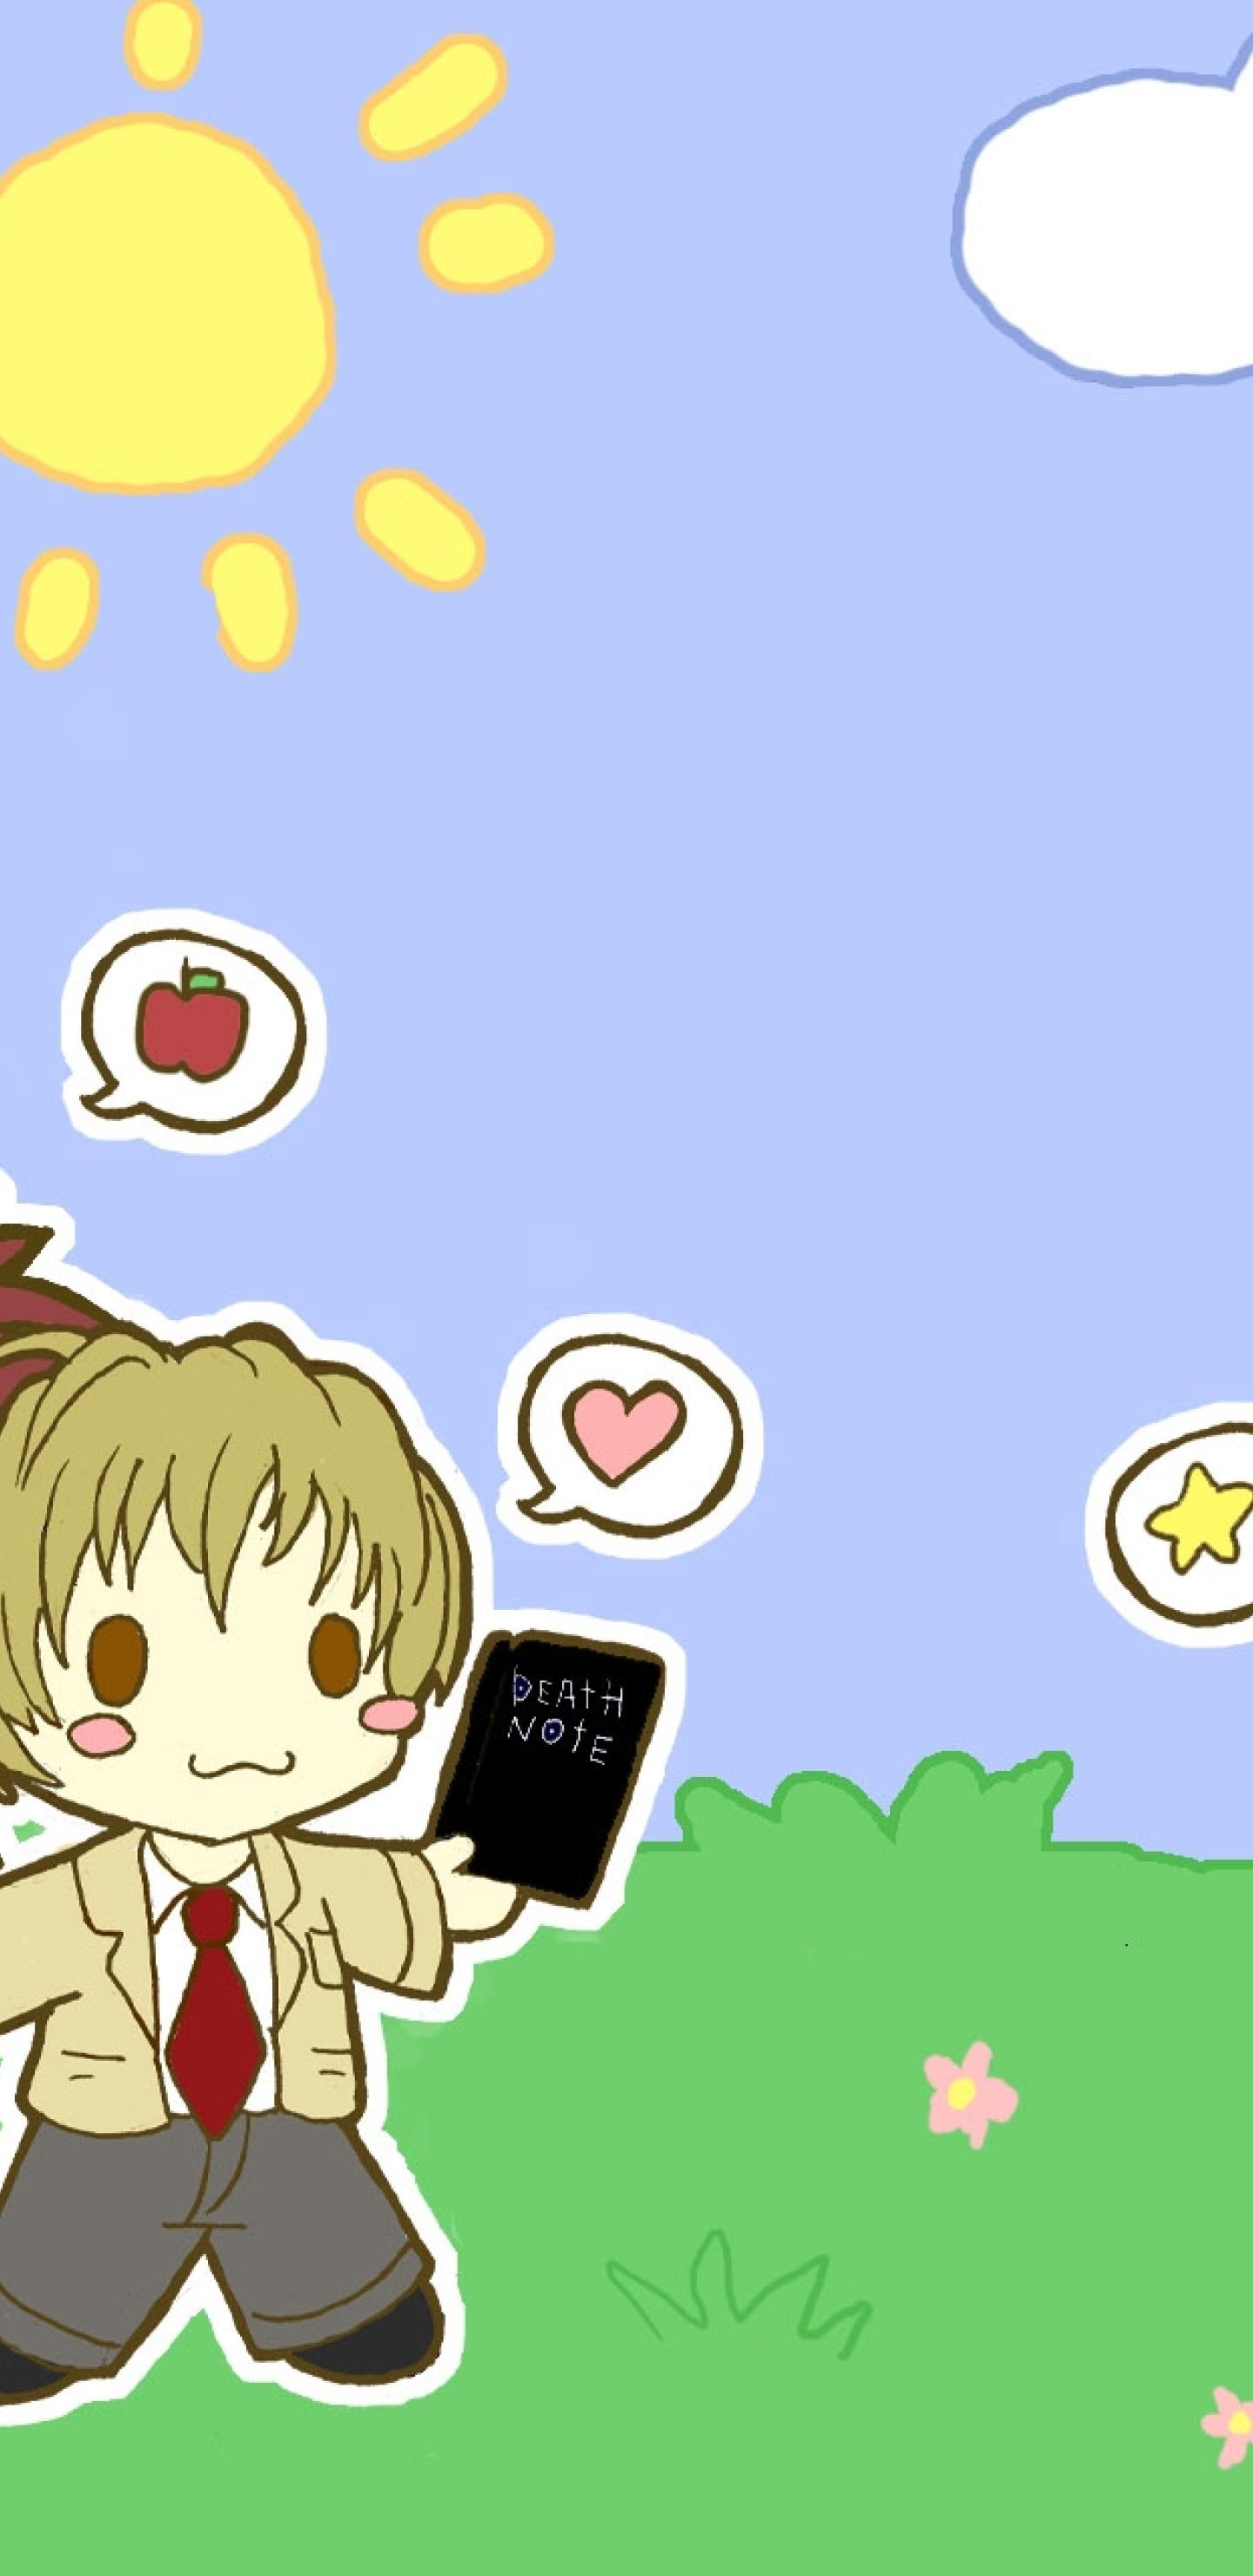 1440x2960 Chibi Death Note L Ryuk Yagami Samsung Galaxy Note 9 8